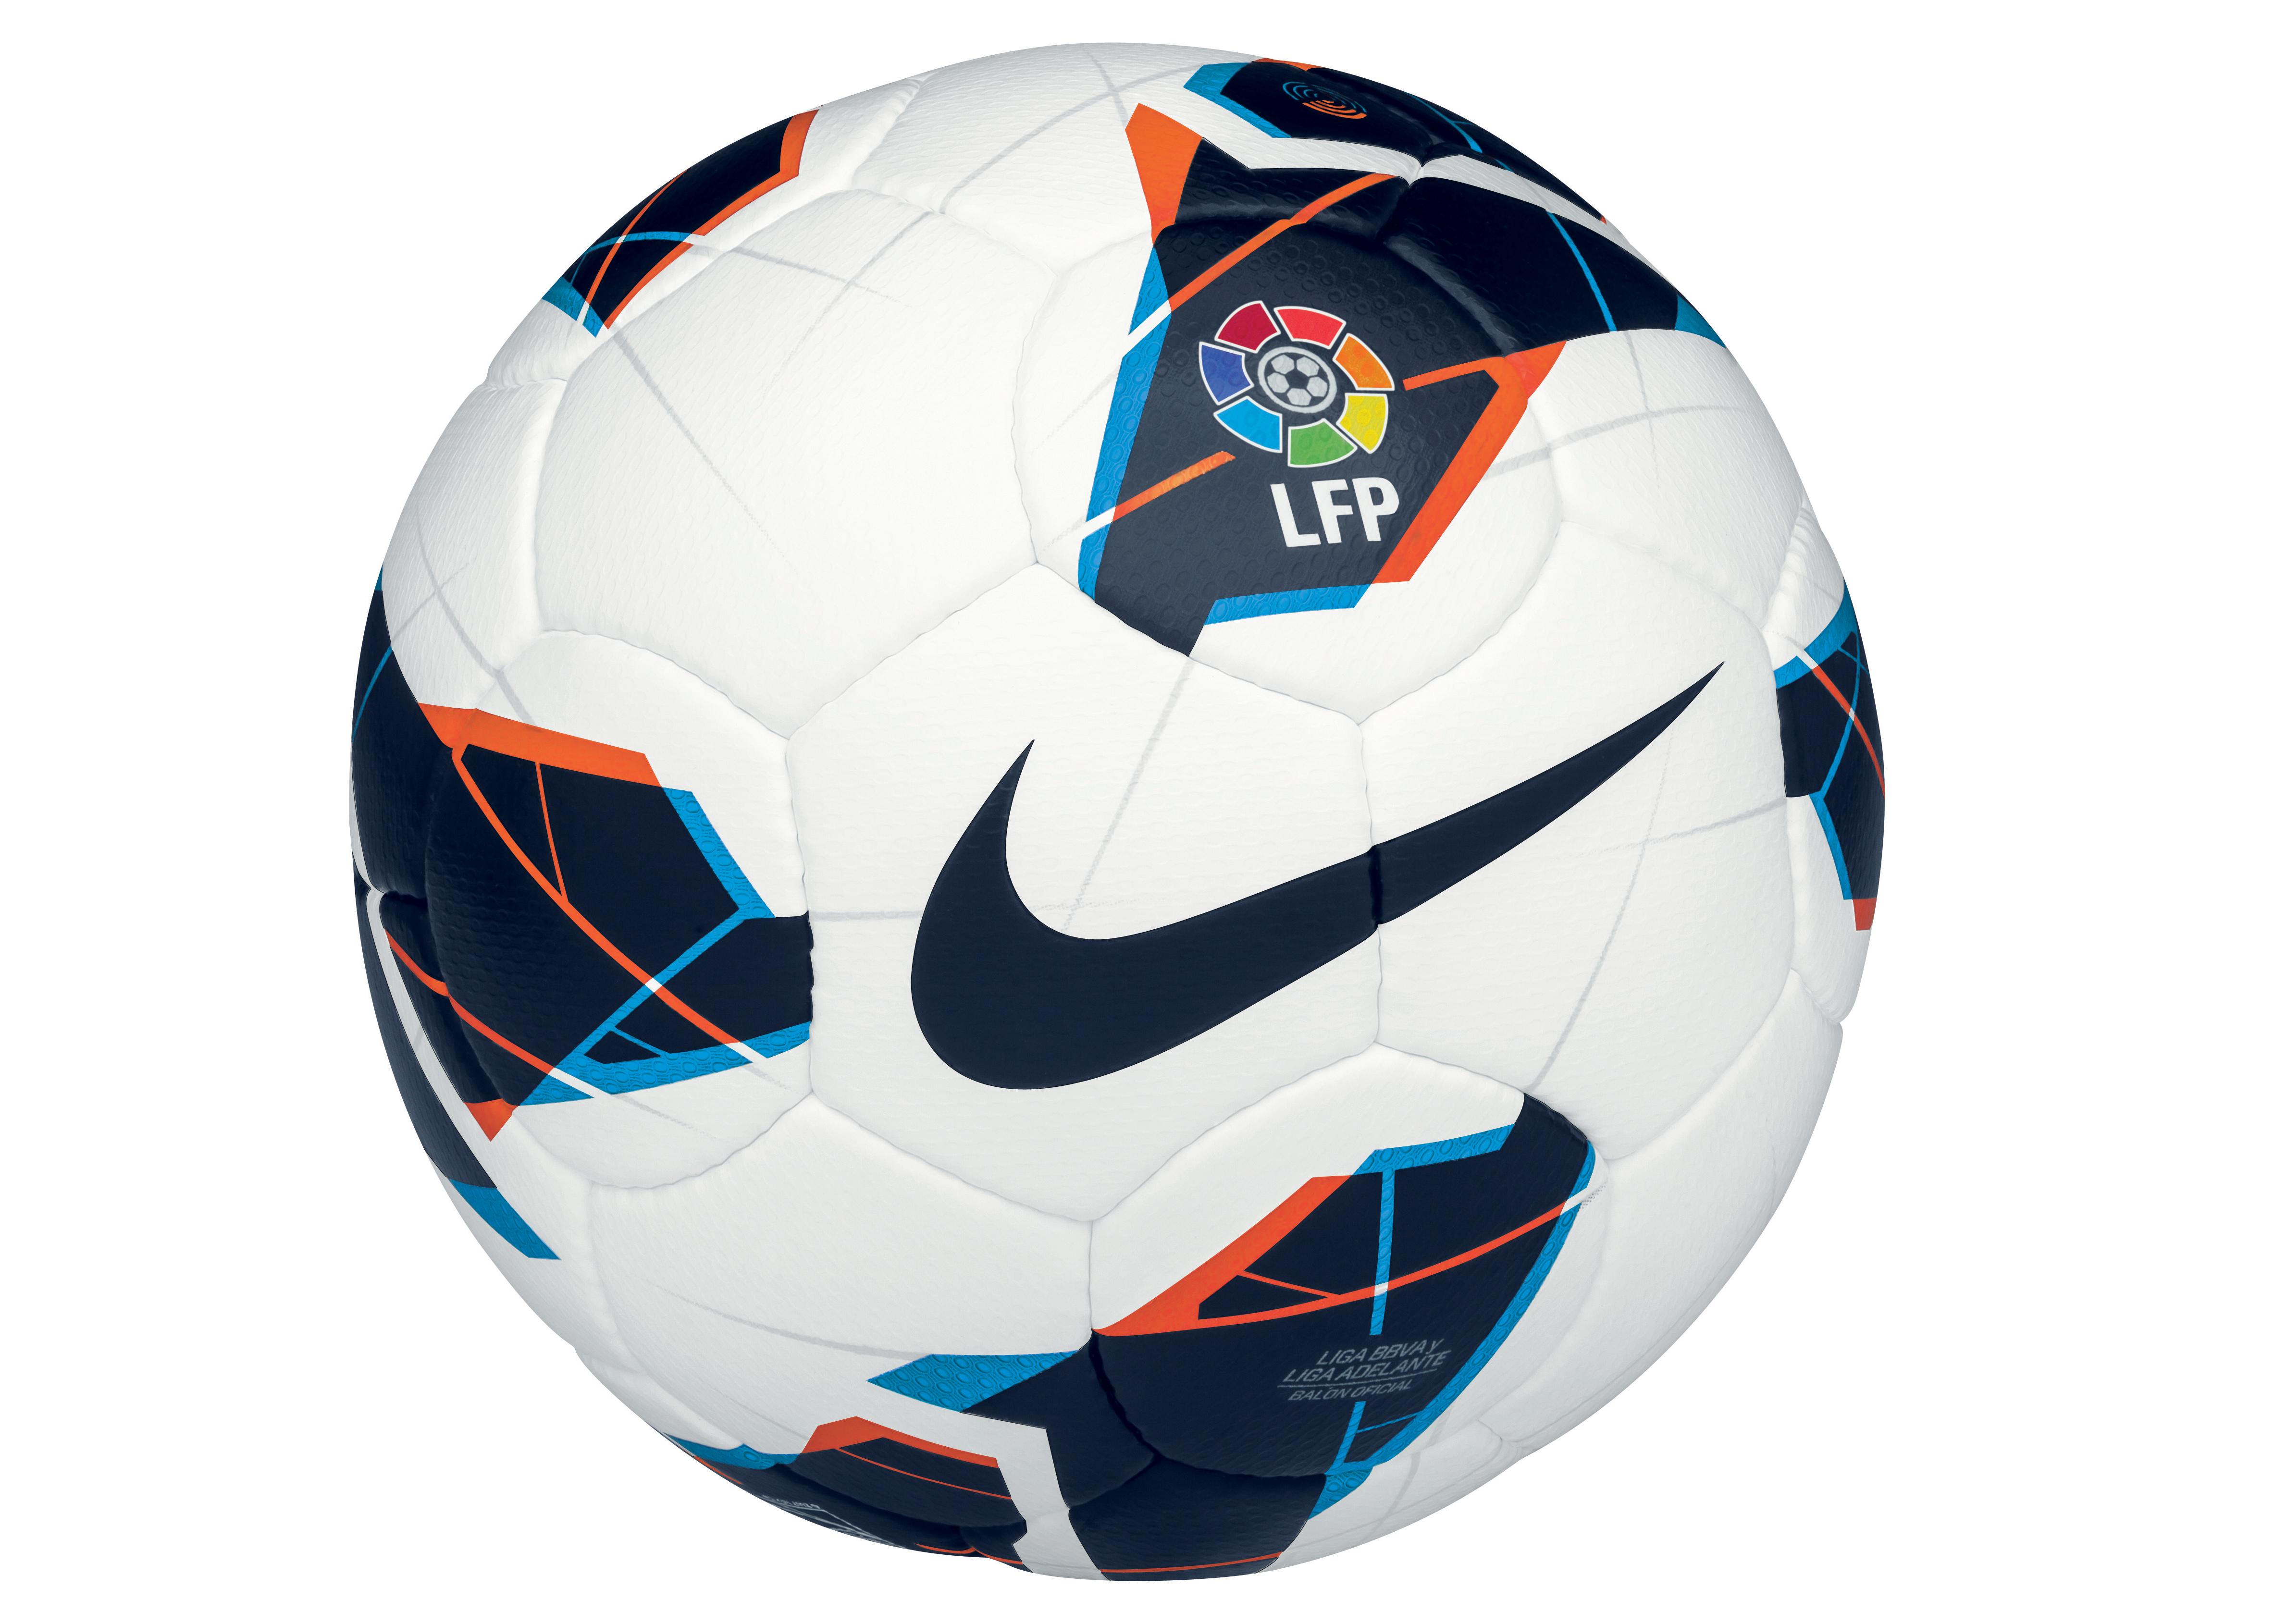 Nike unveils Maxim Ball for the 2012-13 Liga BBVA season ... - photo#24